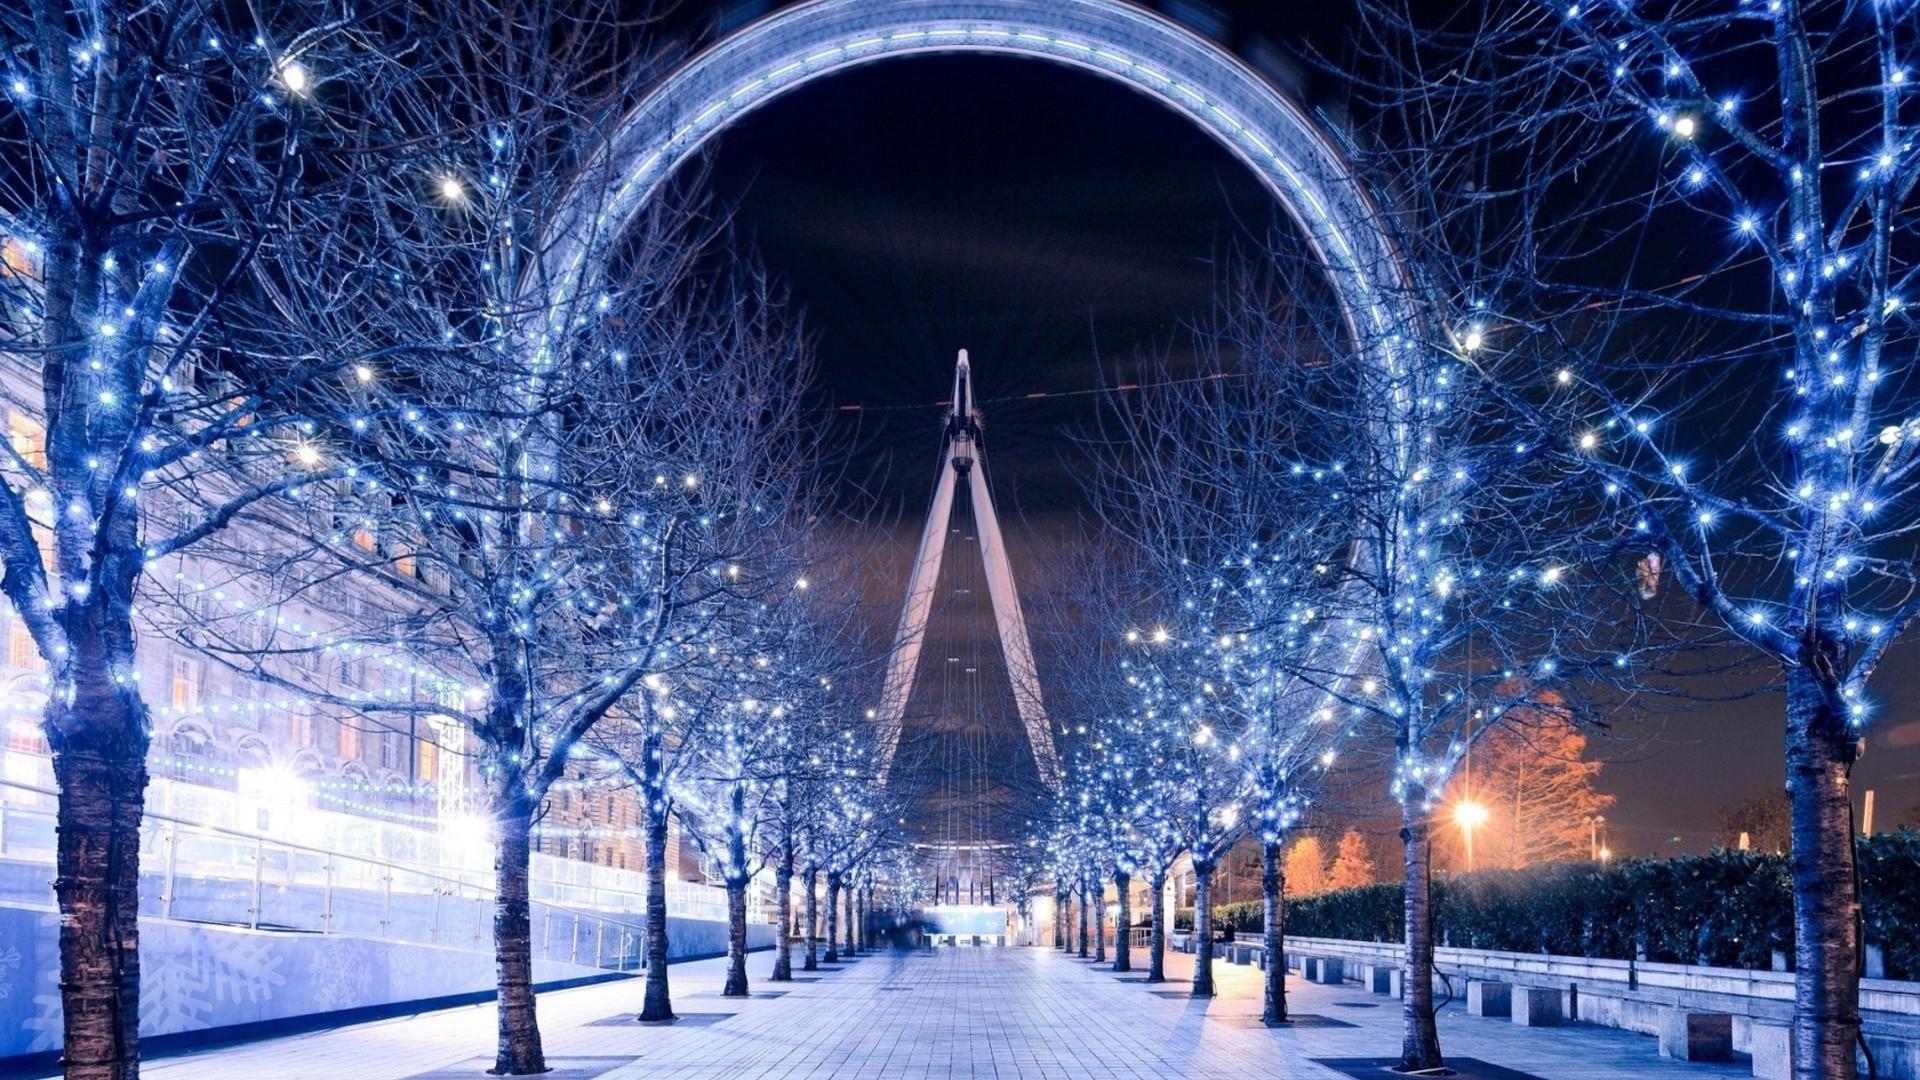 trees London city night reflection sky snow winter symmetry ice arch path christmas lights London Eye light lighting christmas decoration 190543